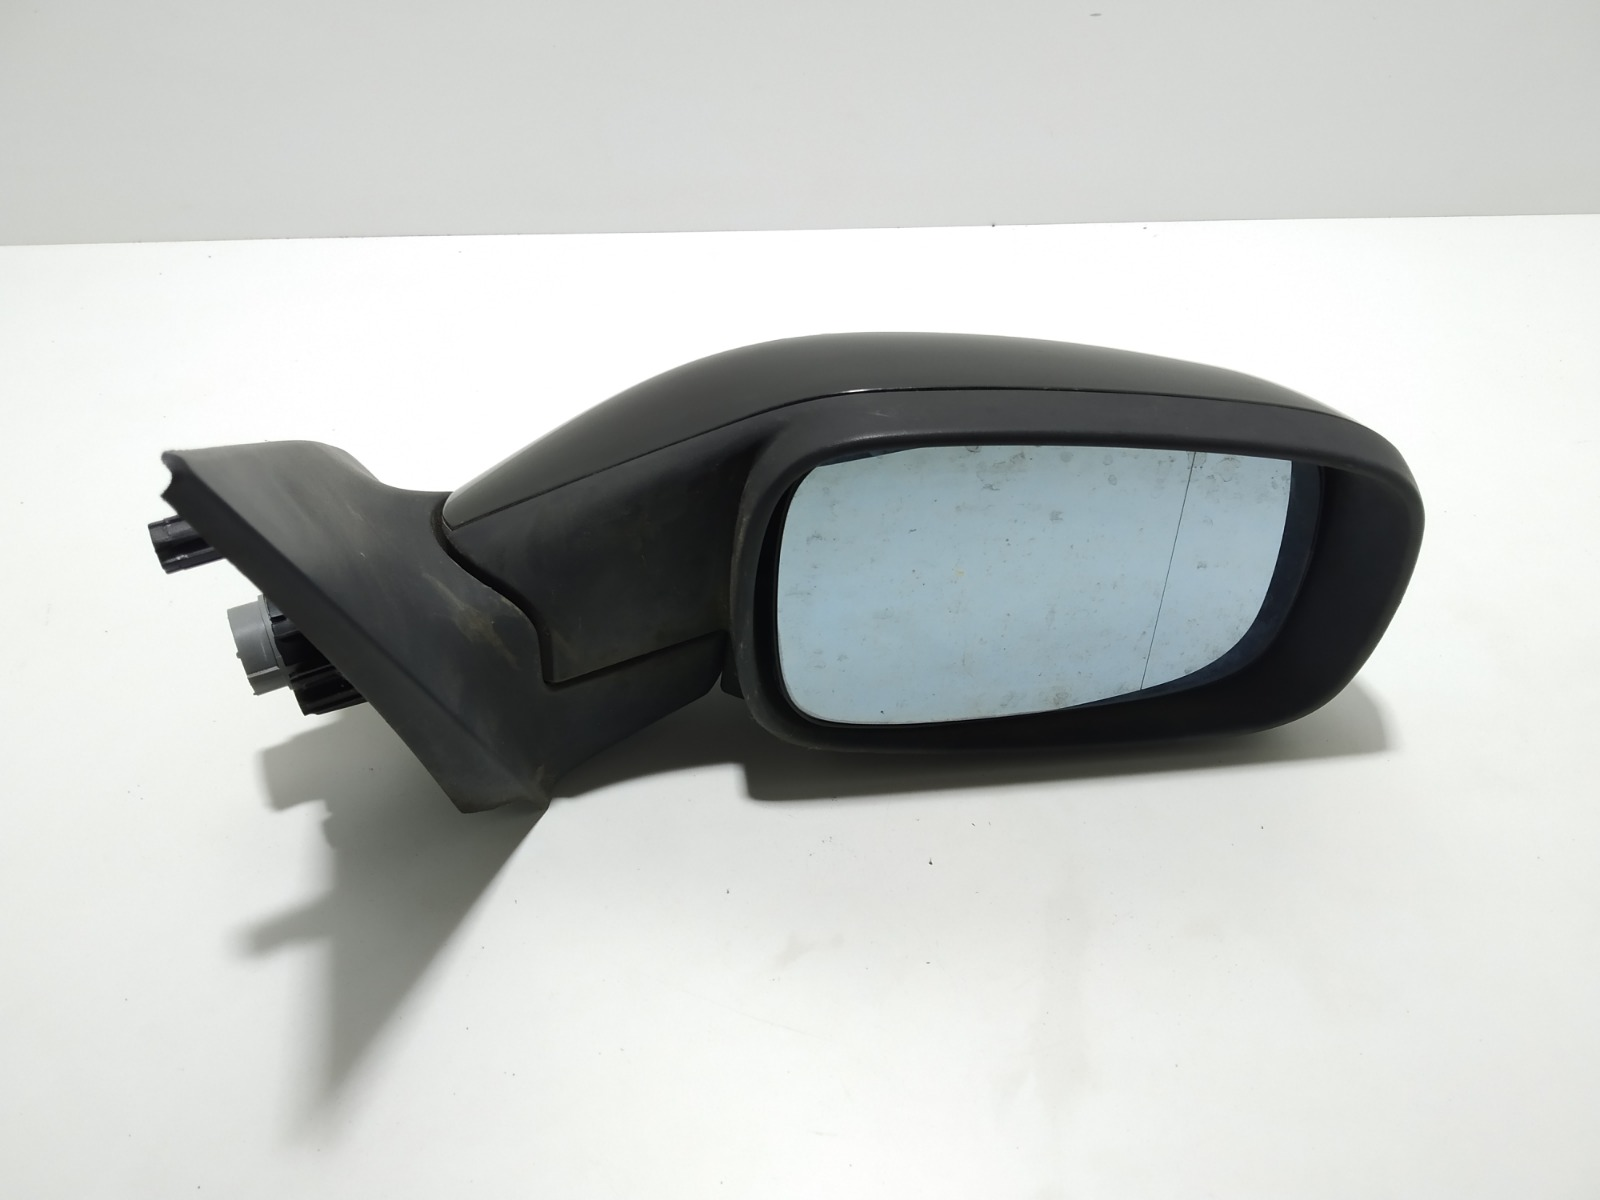 Зеркало наружное правое Renault Laguna 2.0 I 2007 (б/у)